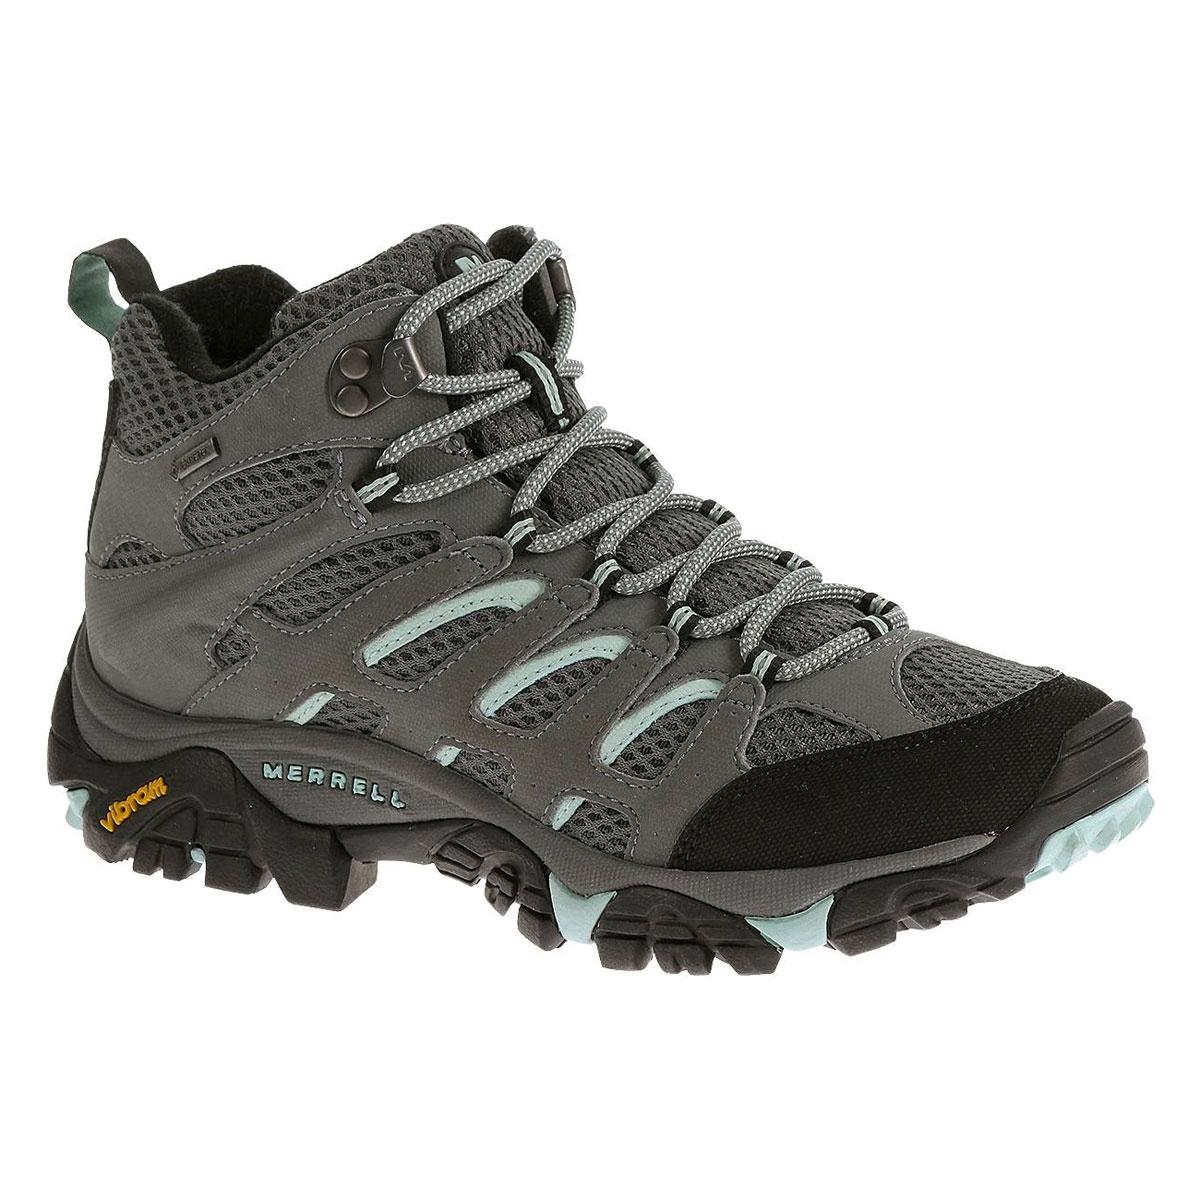 Image of Merrell Moab Mid Gore-Tex Walking Boots (Women s) - Sedona Sage 788942f54d